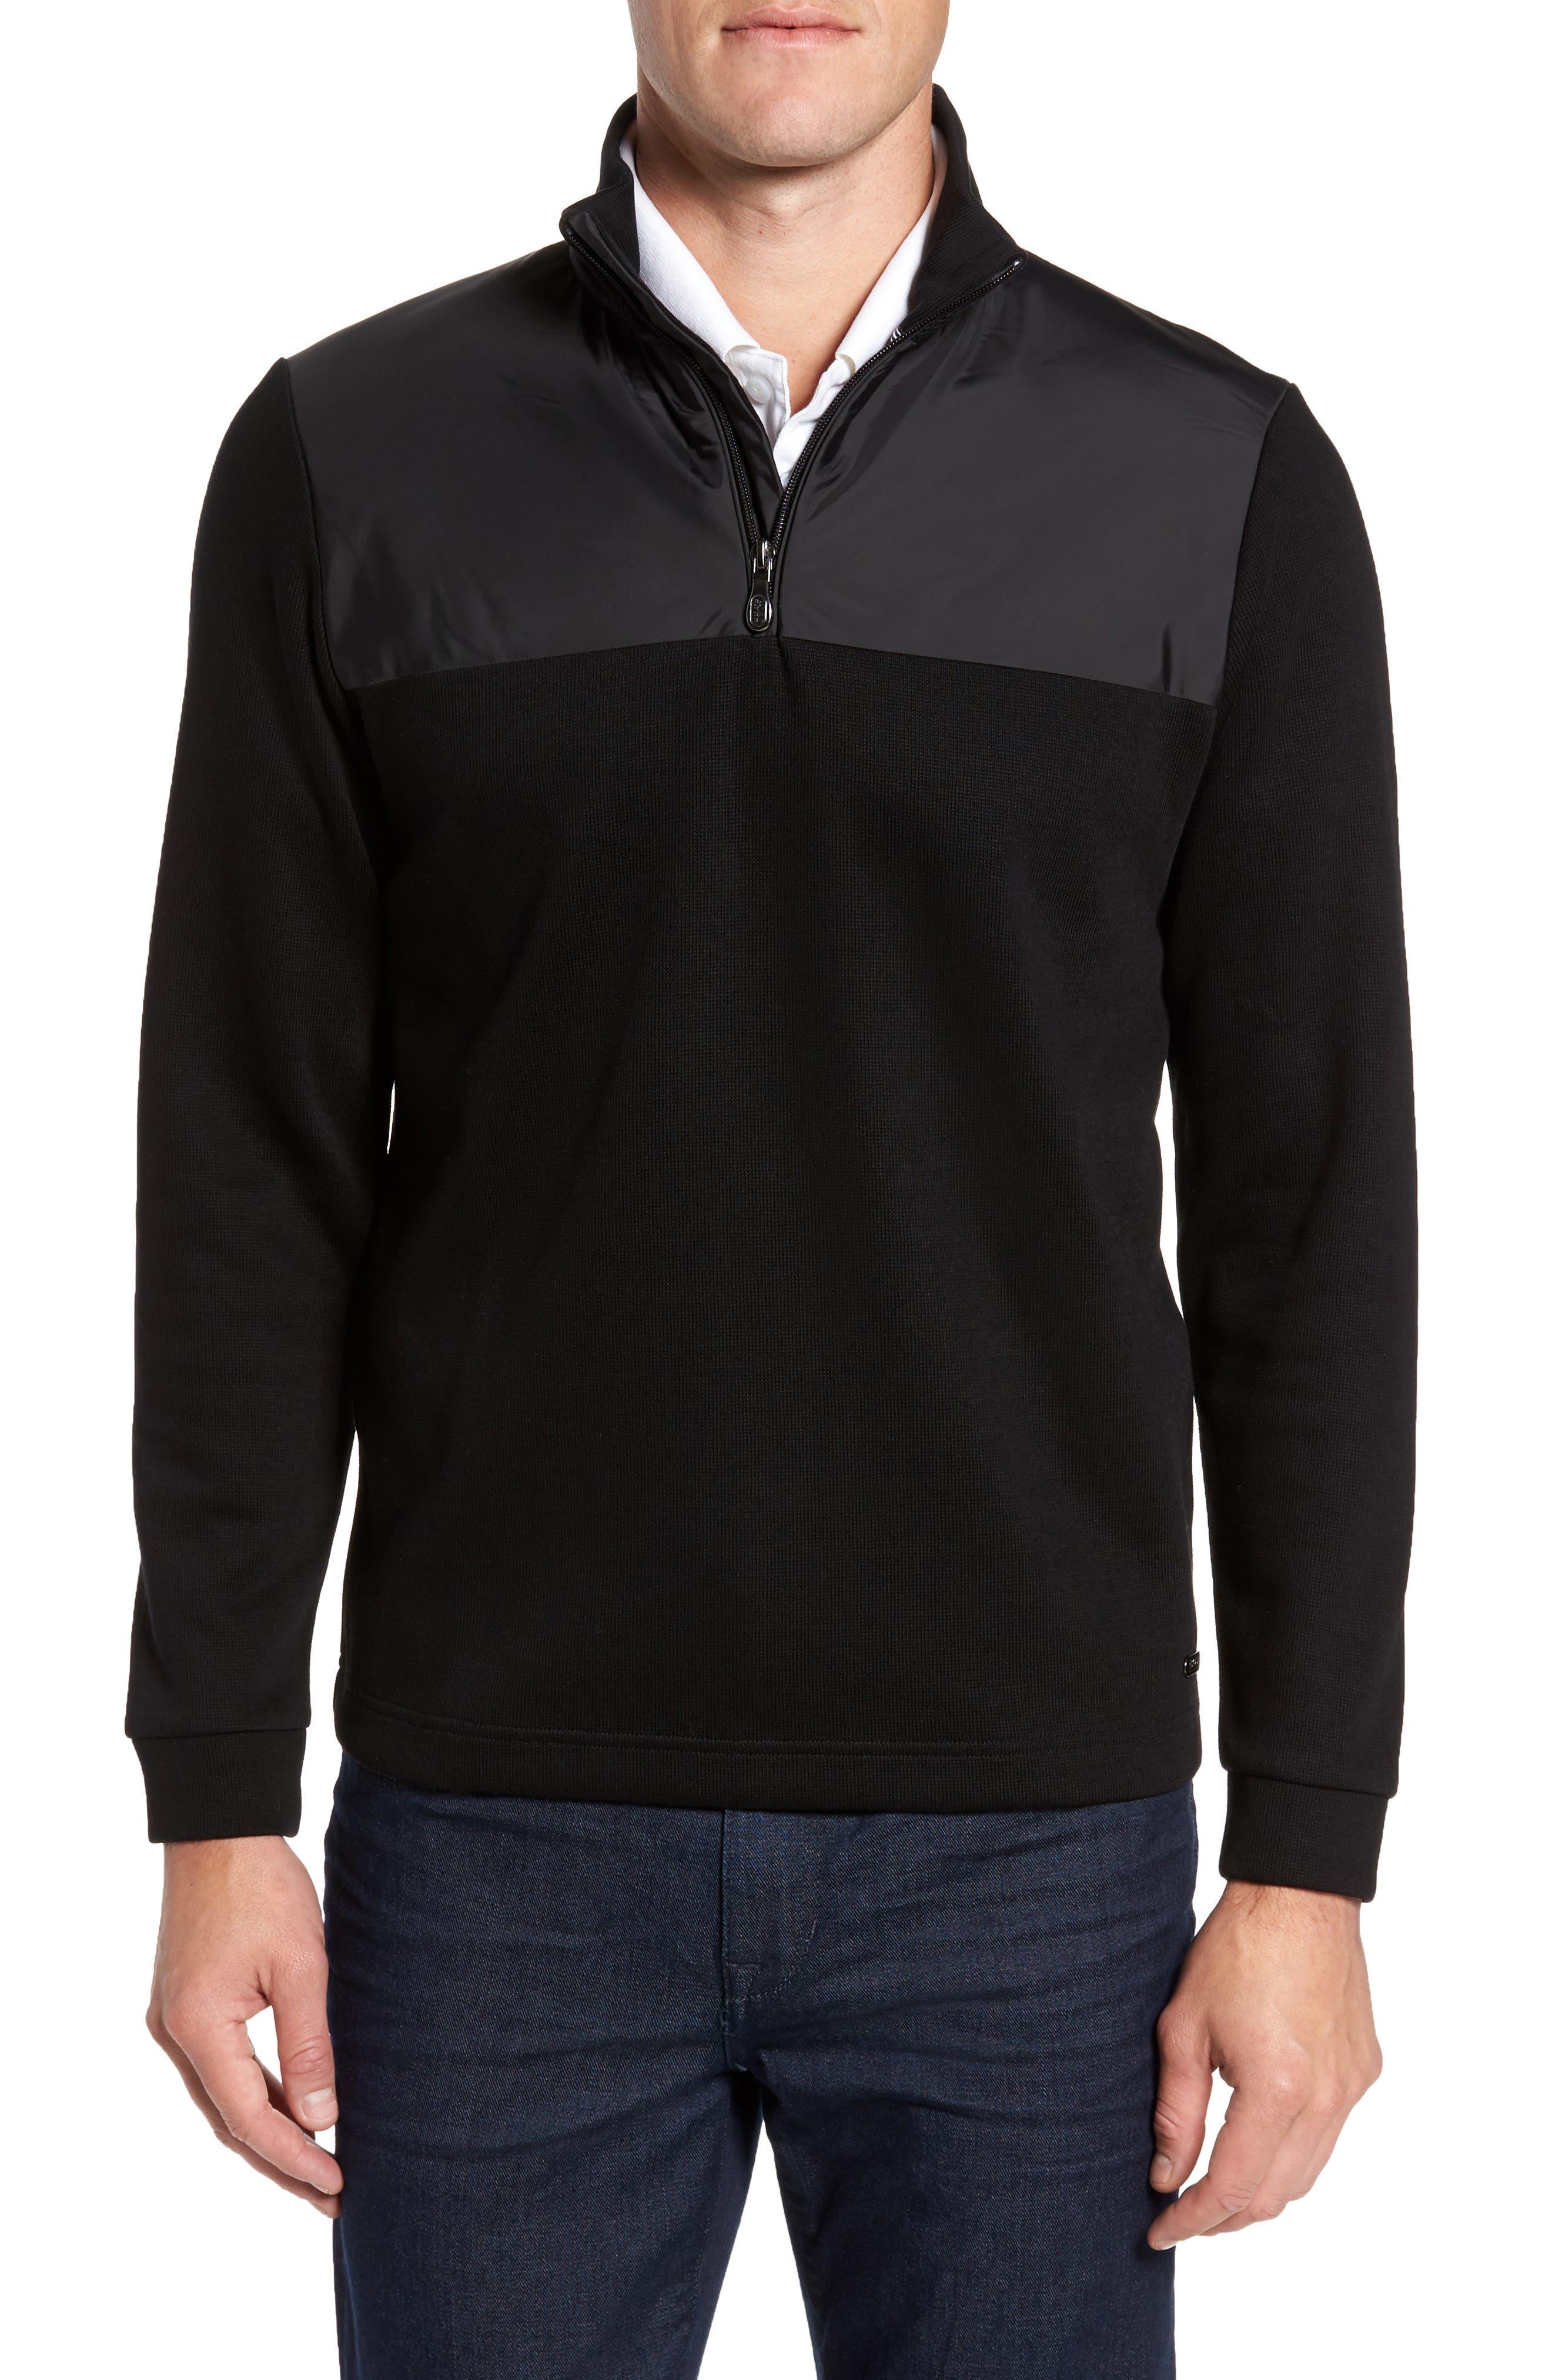 Alternate Image 1 Selected - BOSS C-Piceno Quarter Zip Fleece Pullover